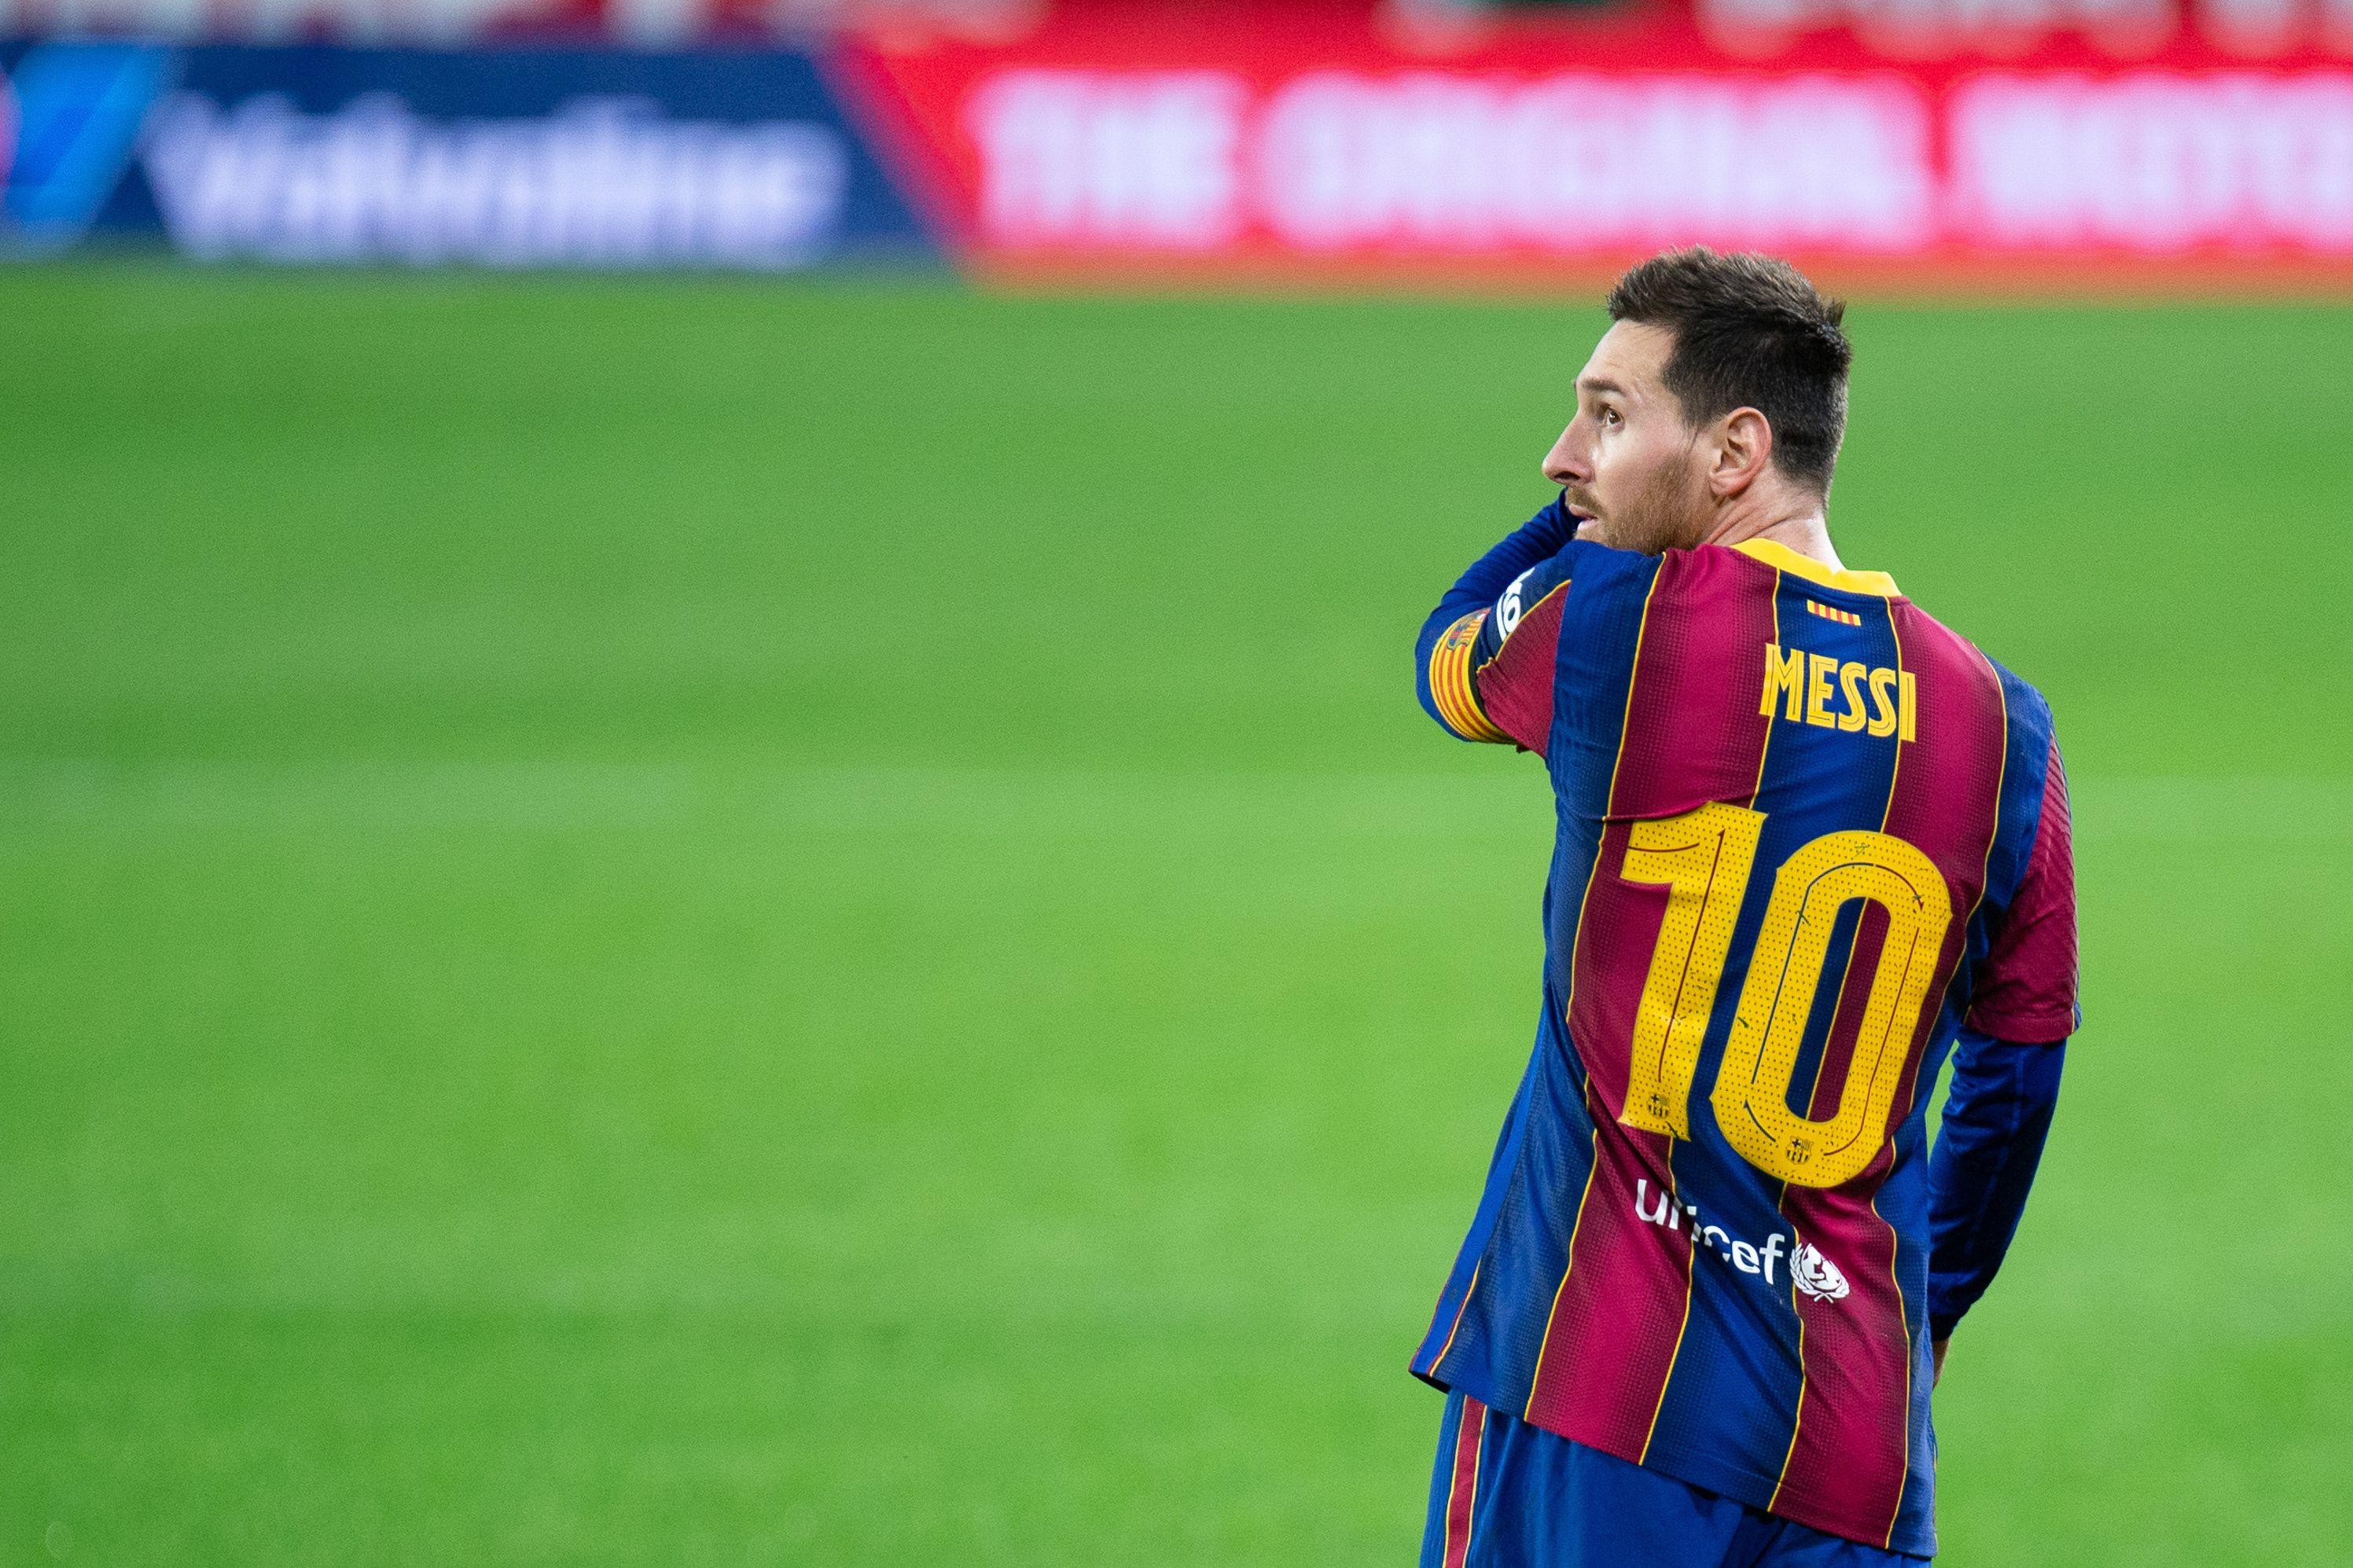 Как 'ПСЖ' разнёс 'Барселону' - 4:1: все голы матча на 'Камп Ноу'. ВИДЕО